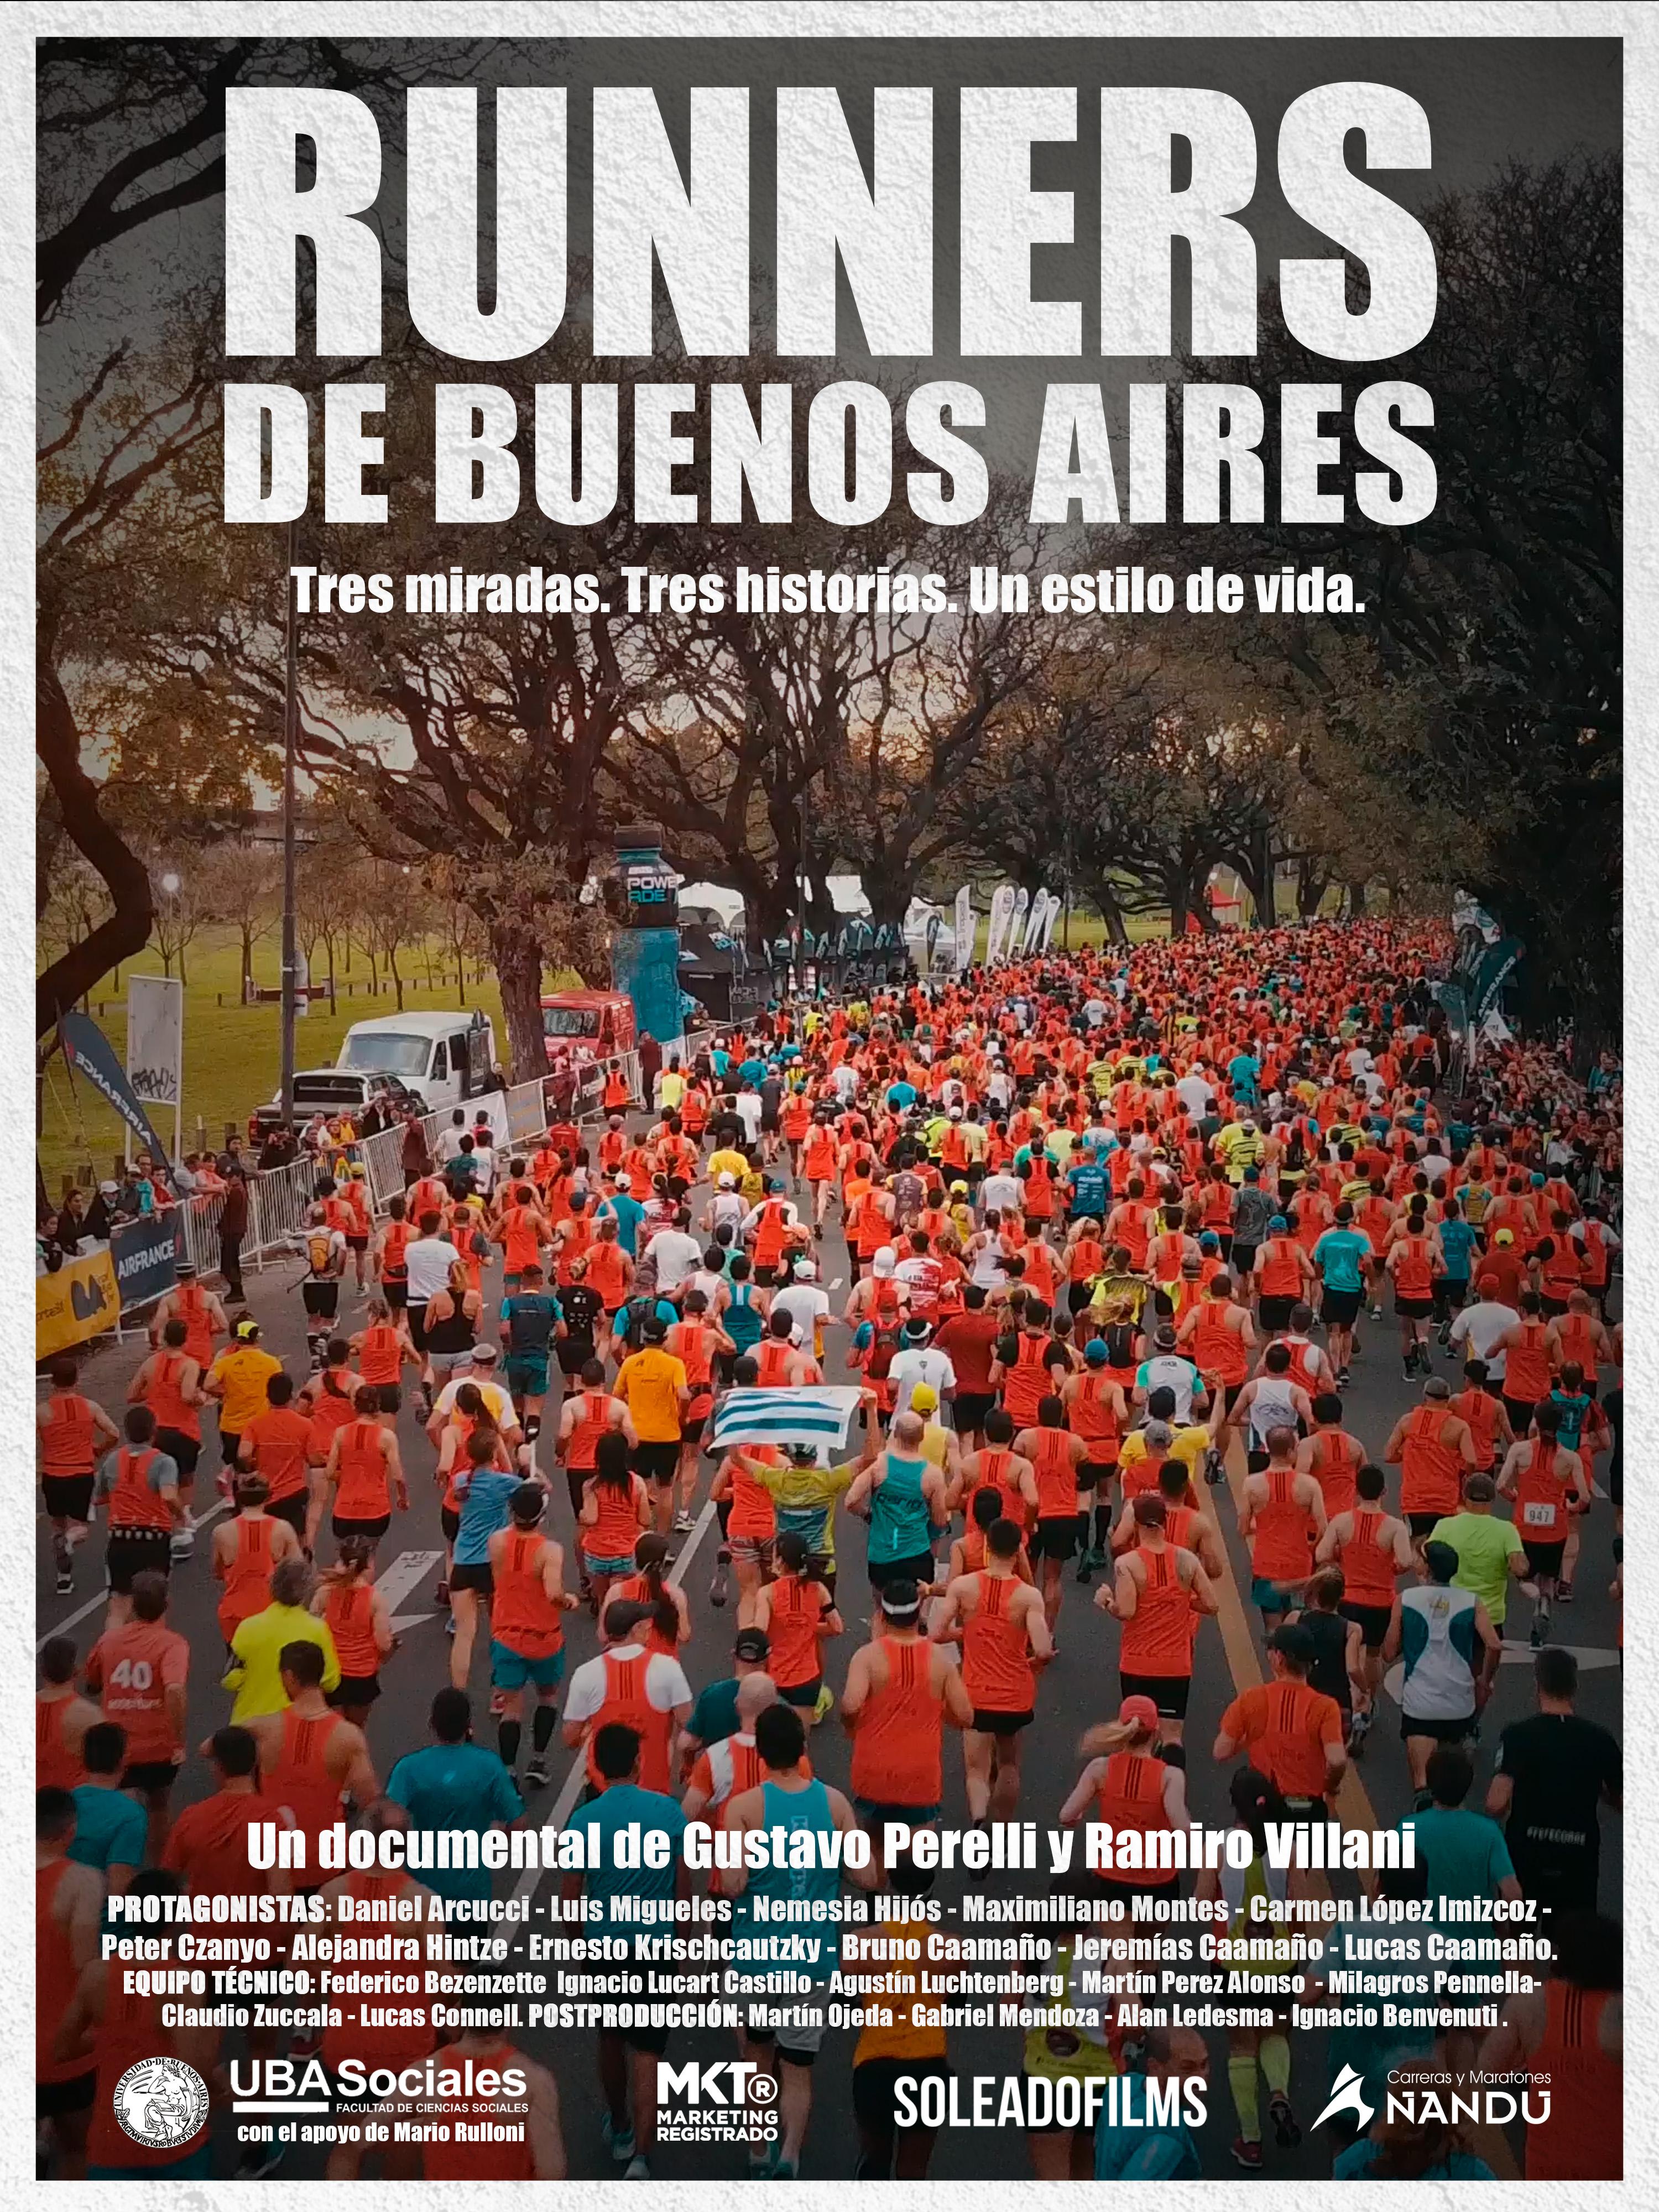 RUNNERS DE BUENOS AIRES